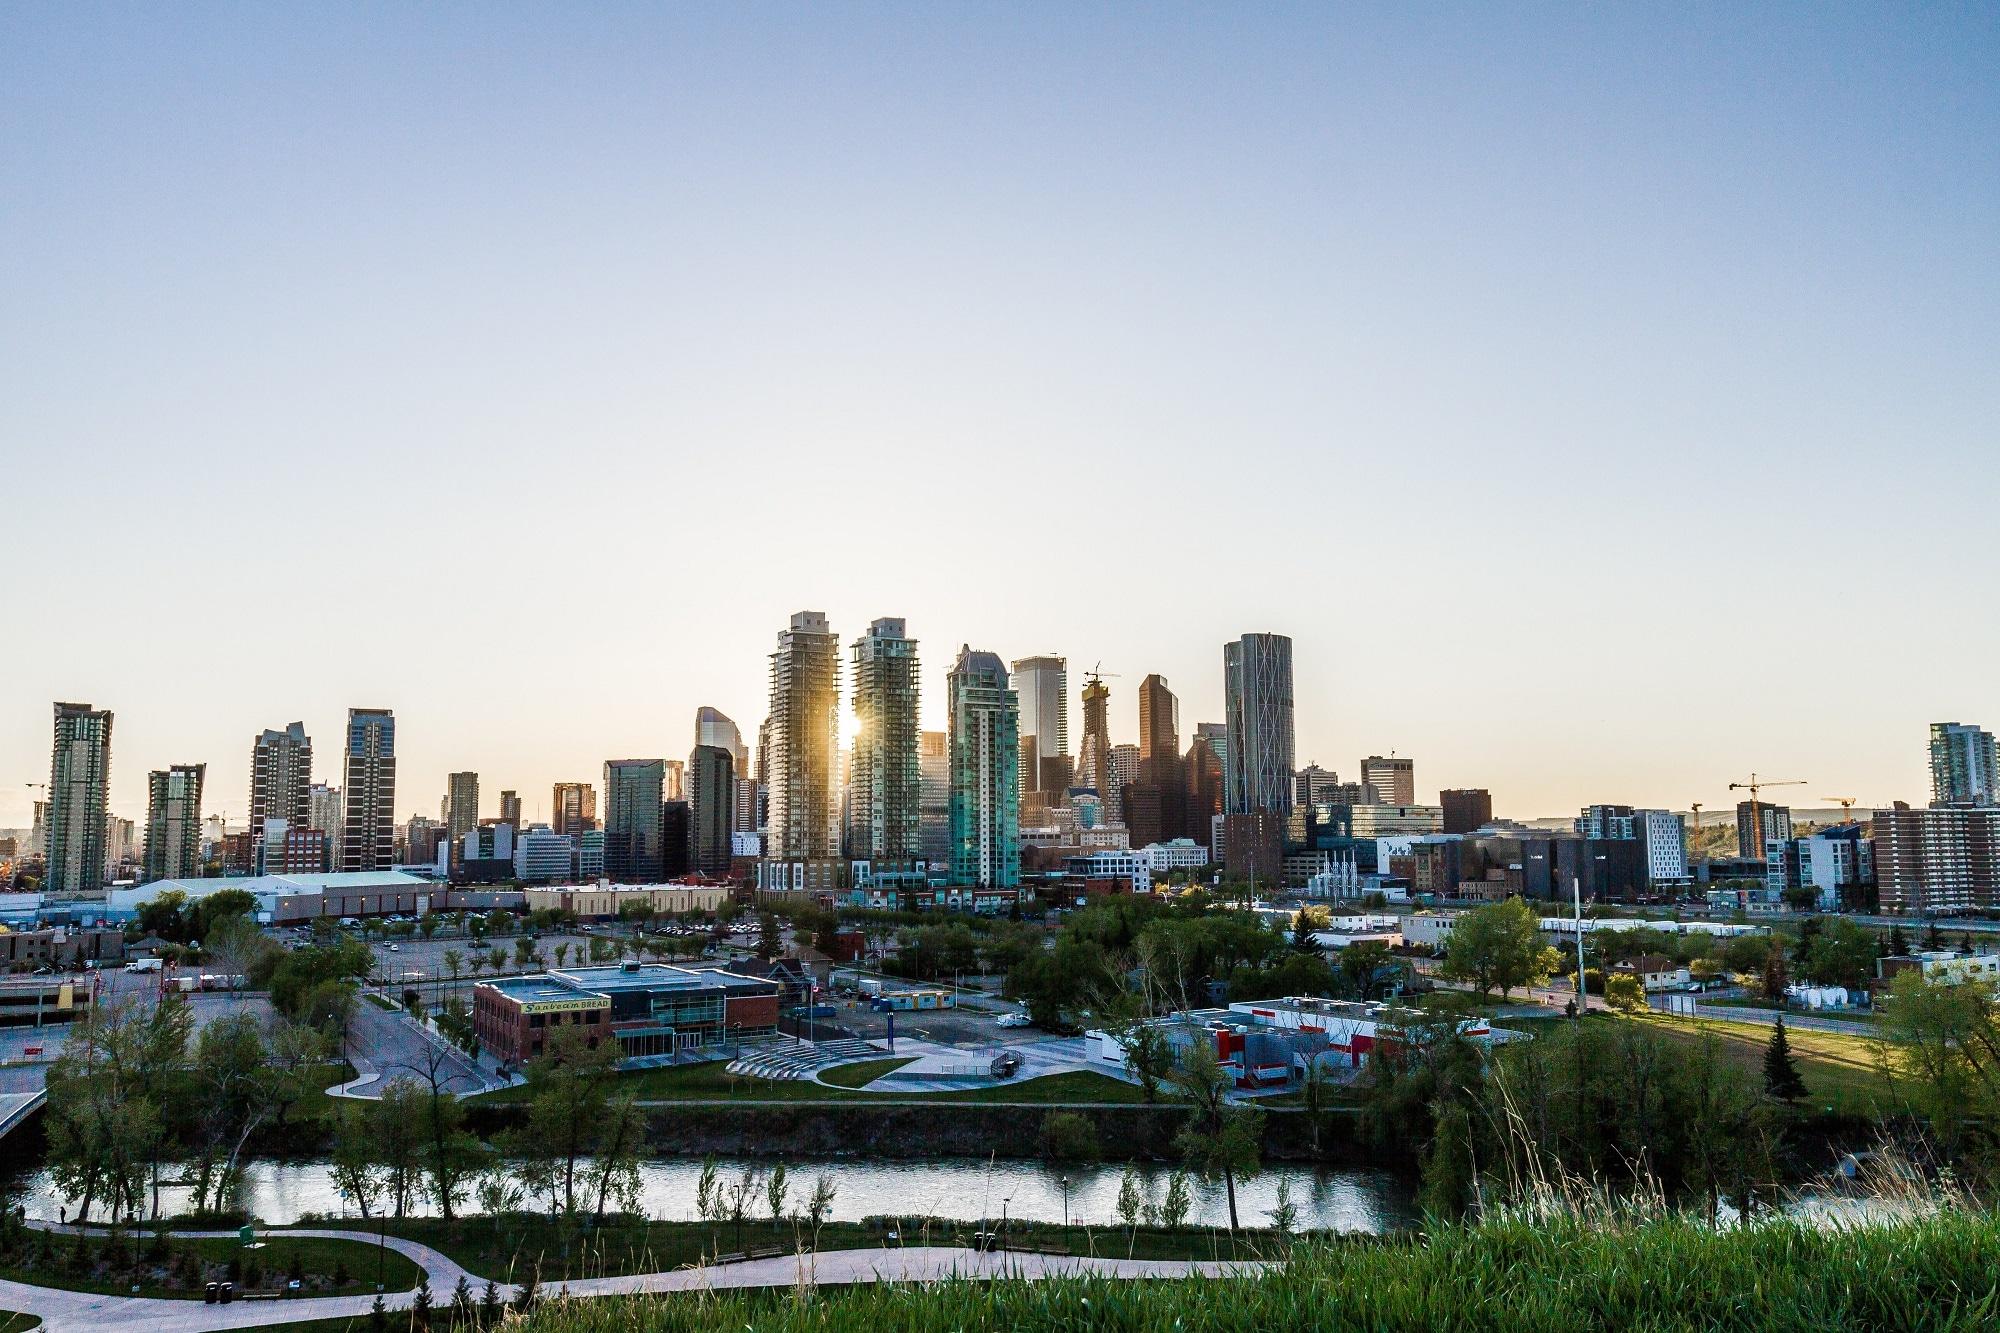 #5. Calgary